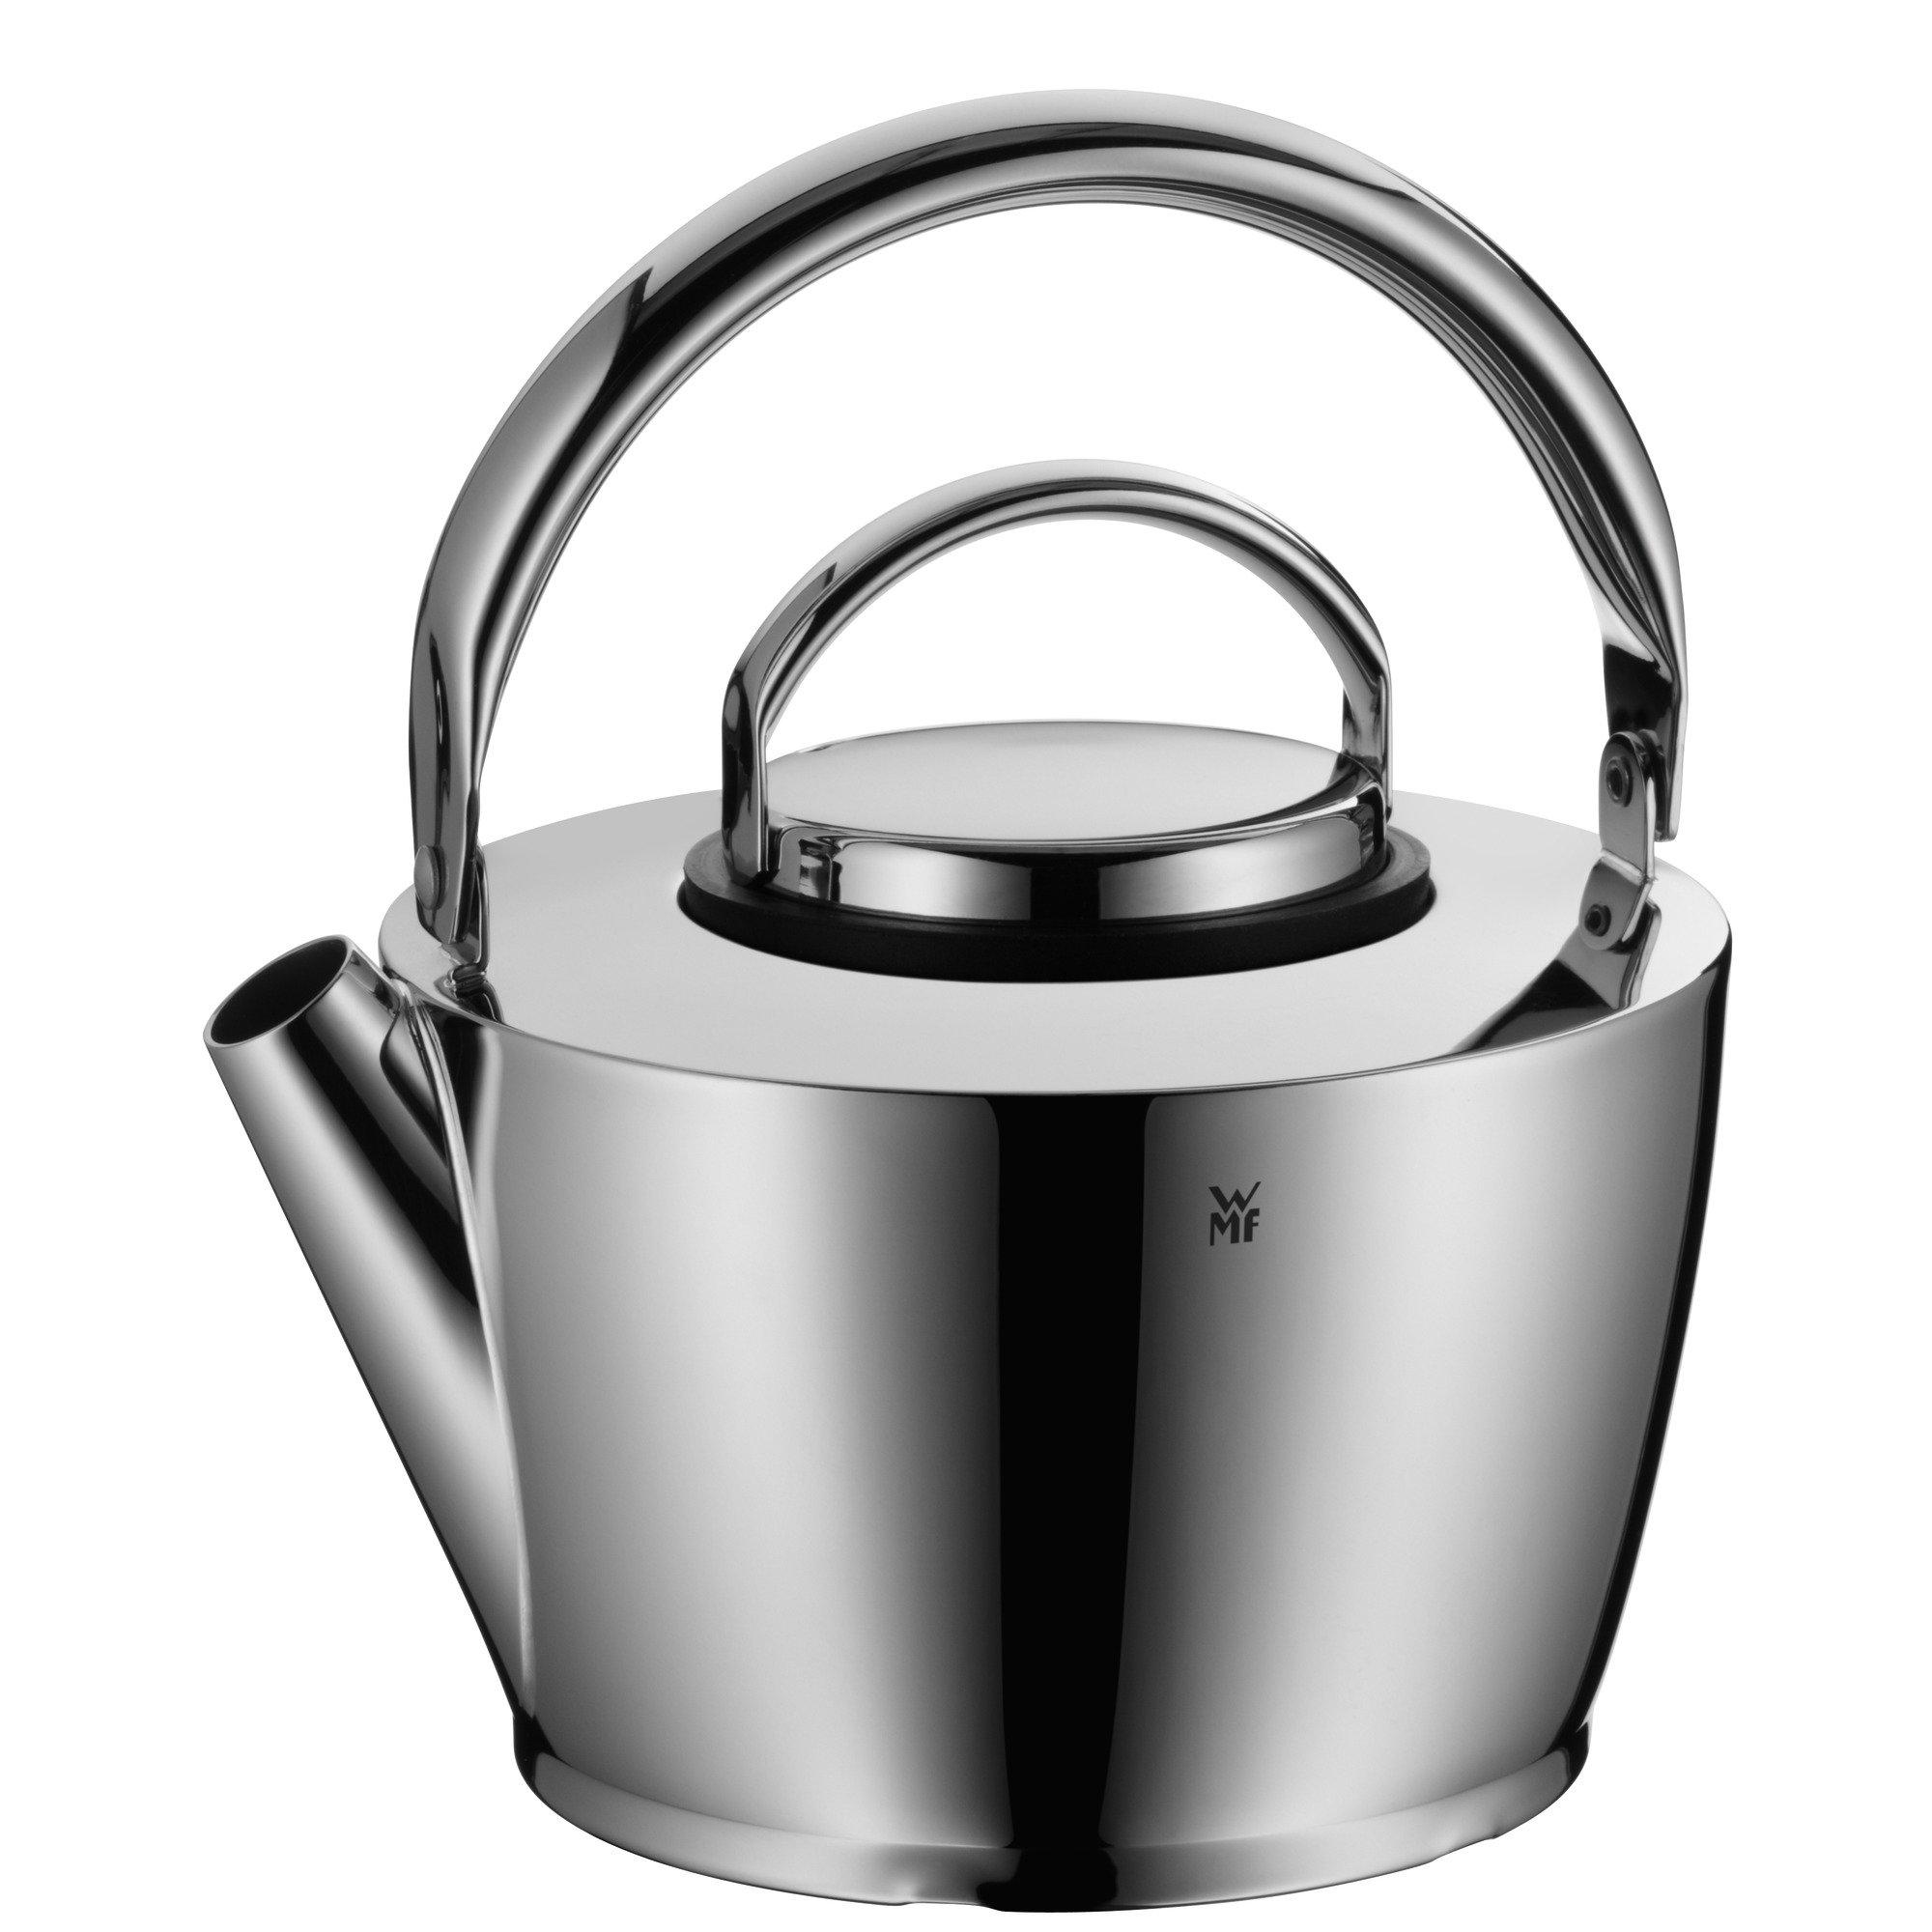 WMF 07.3156.6040 Stainless Steel 0.9 Liter Tea Kettle